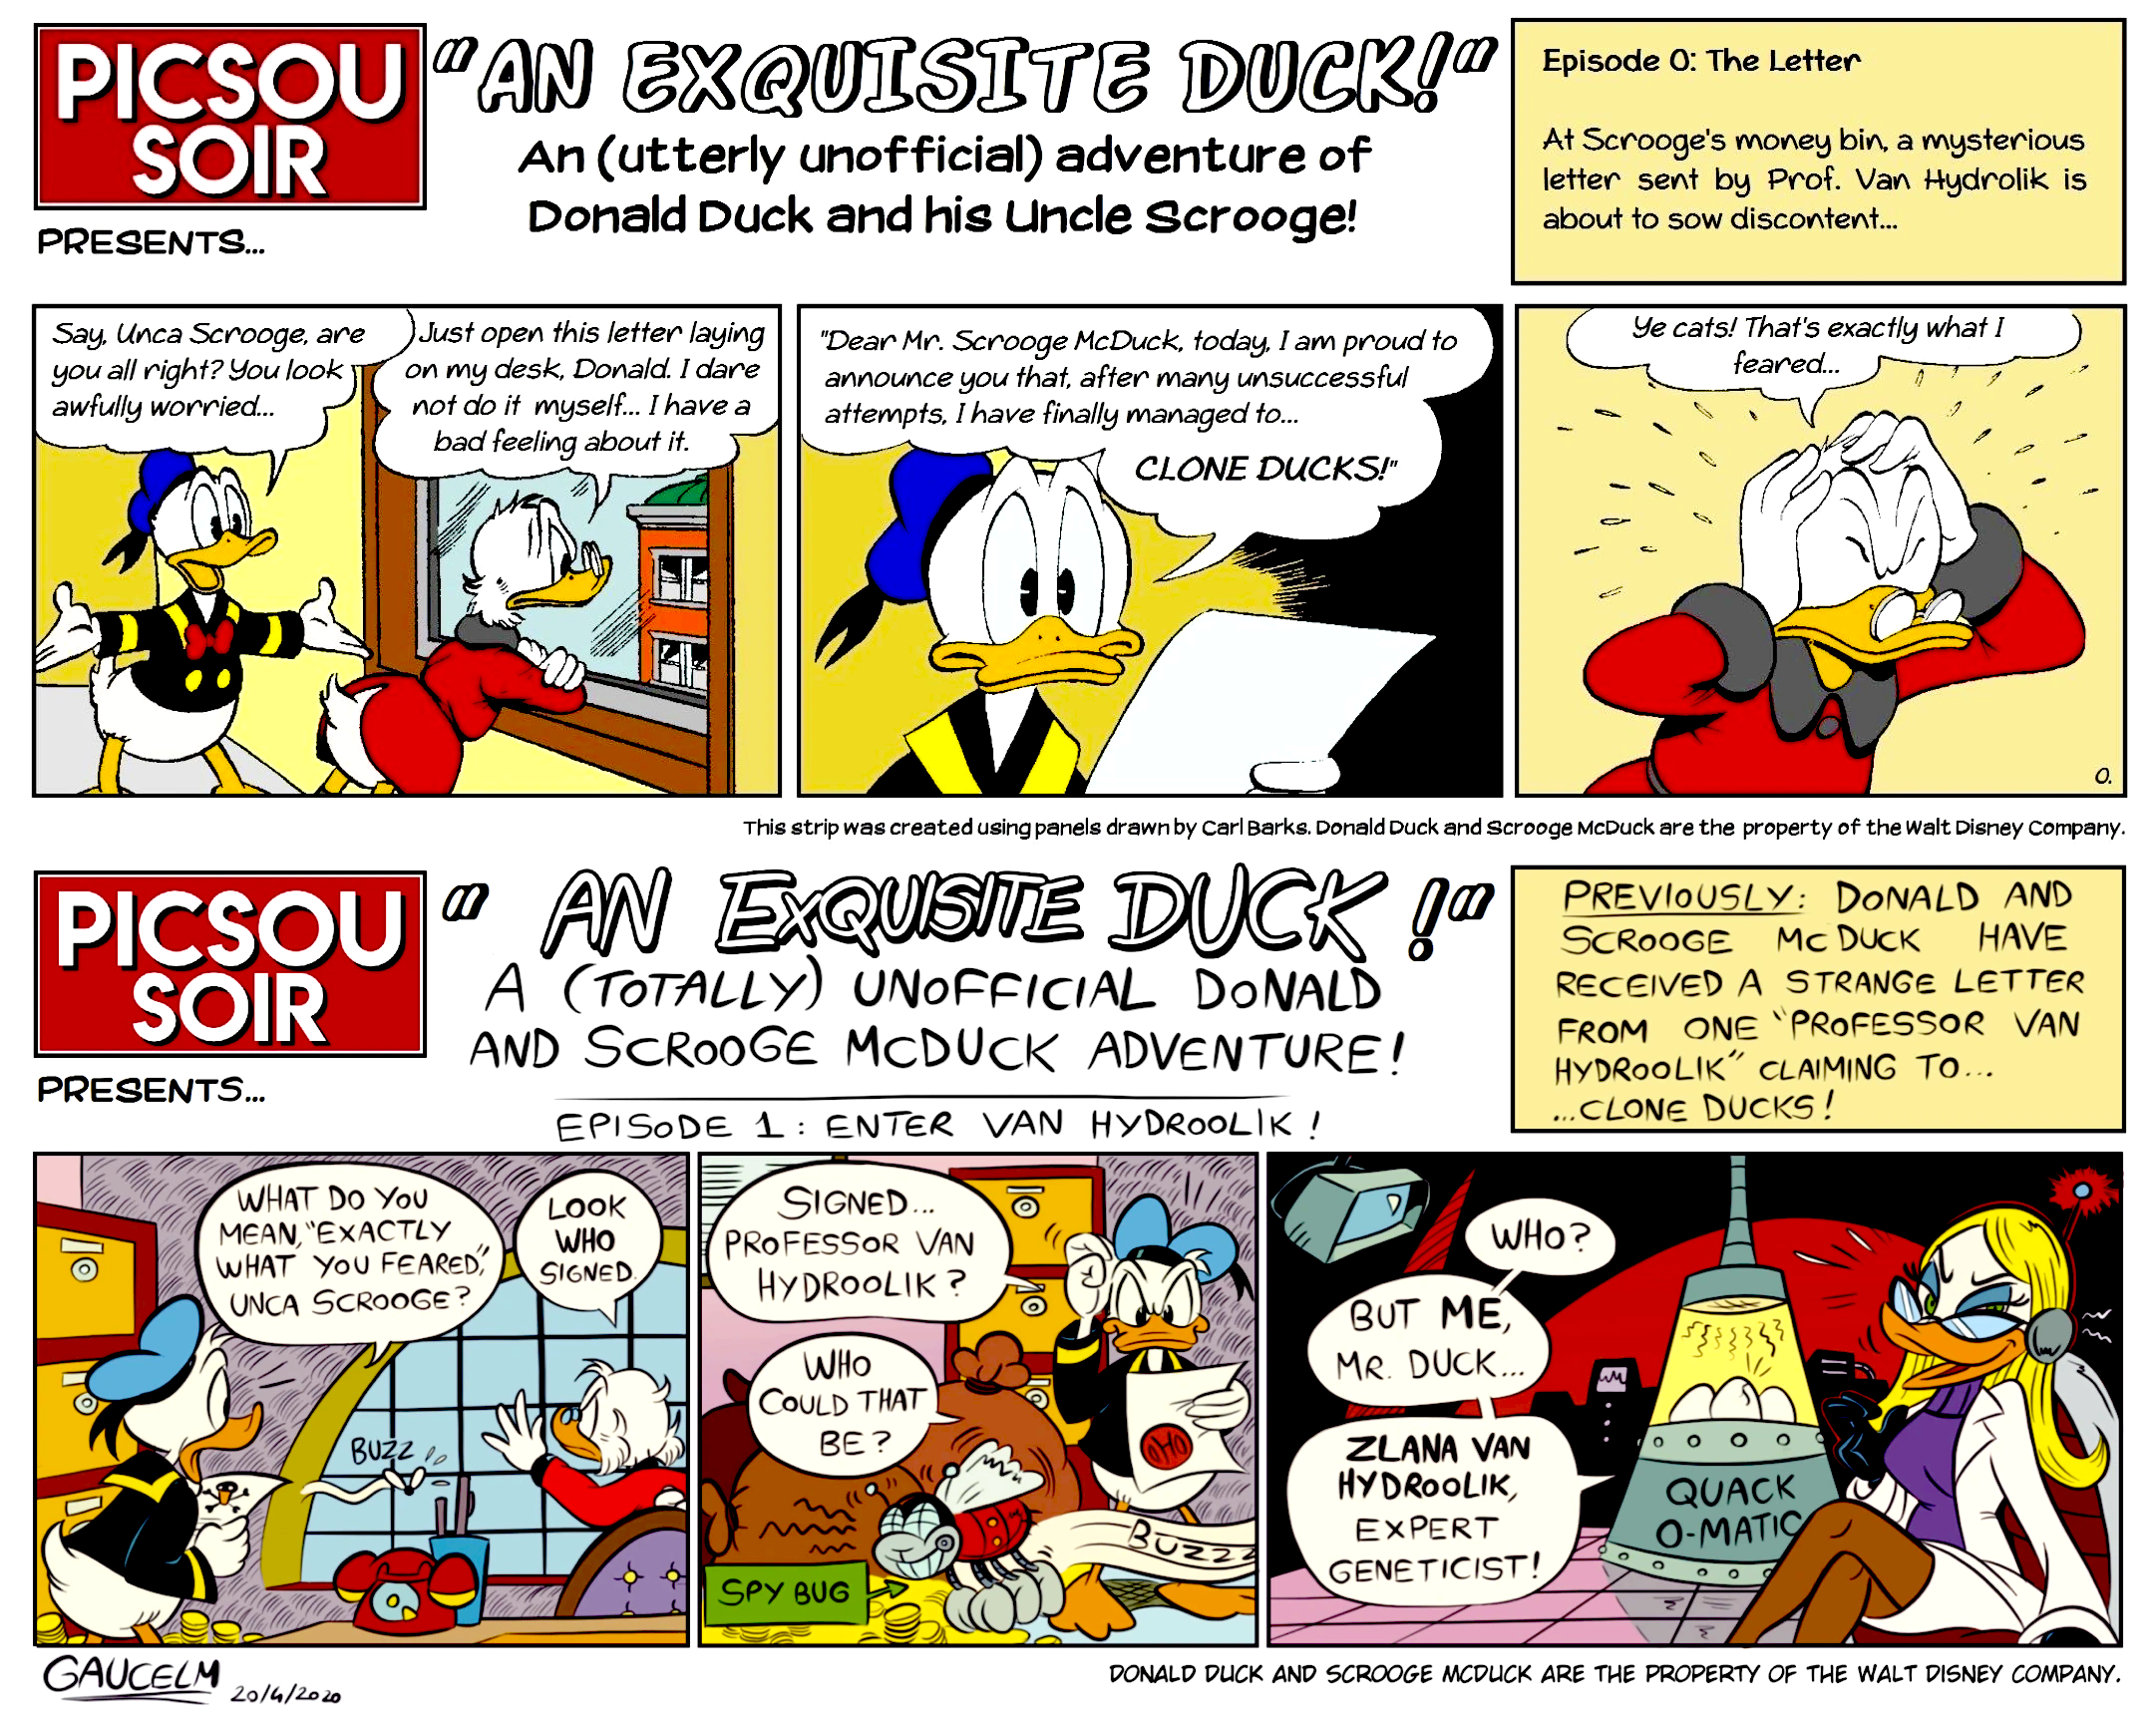 An Exquisite Duck!